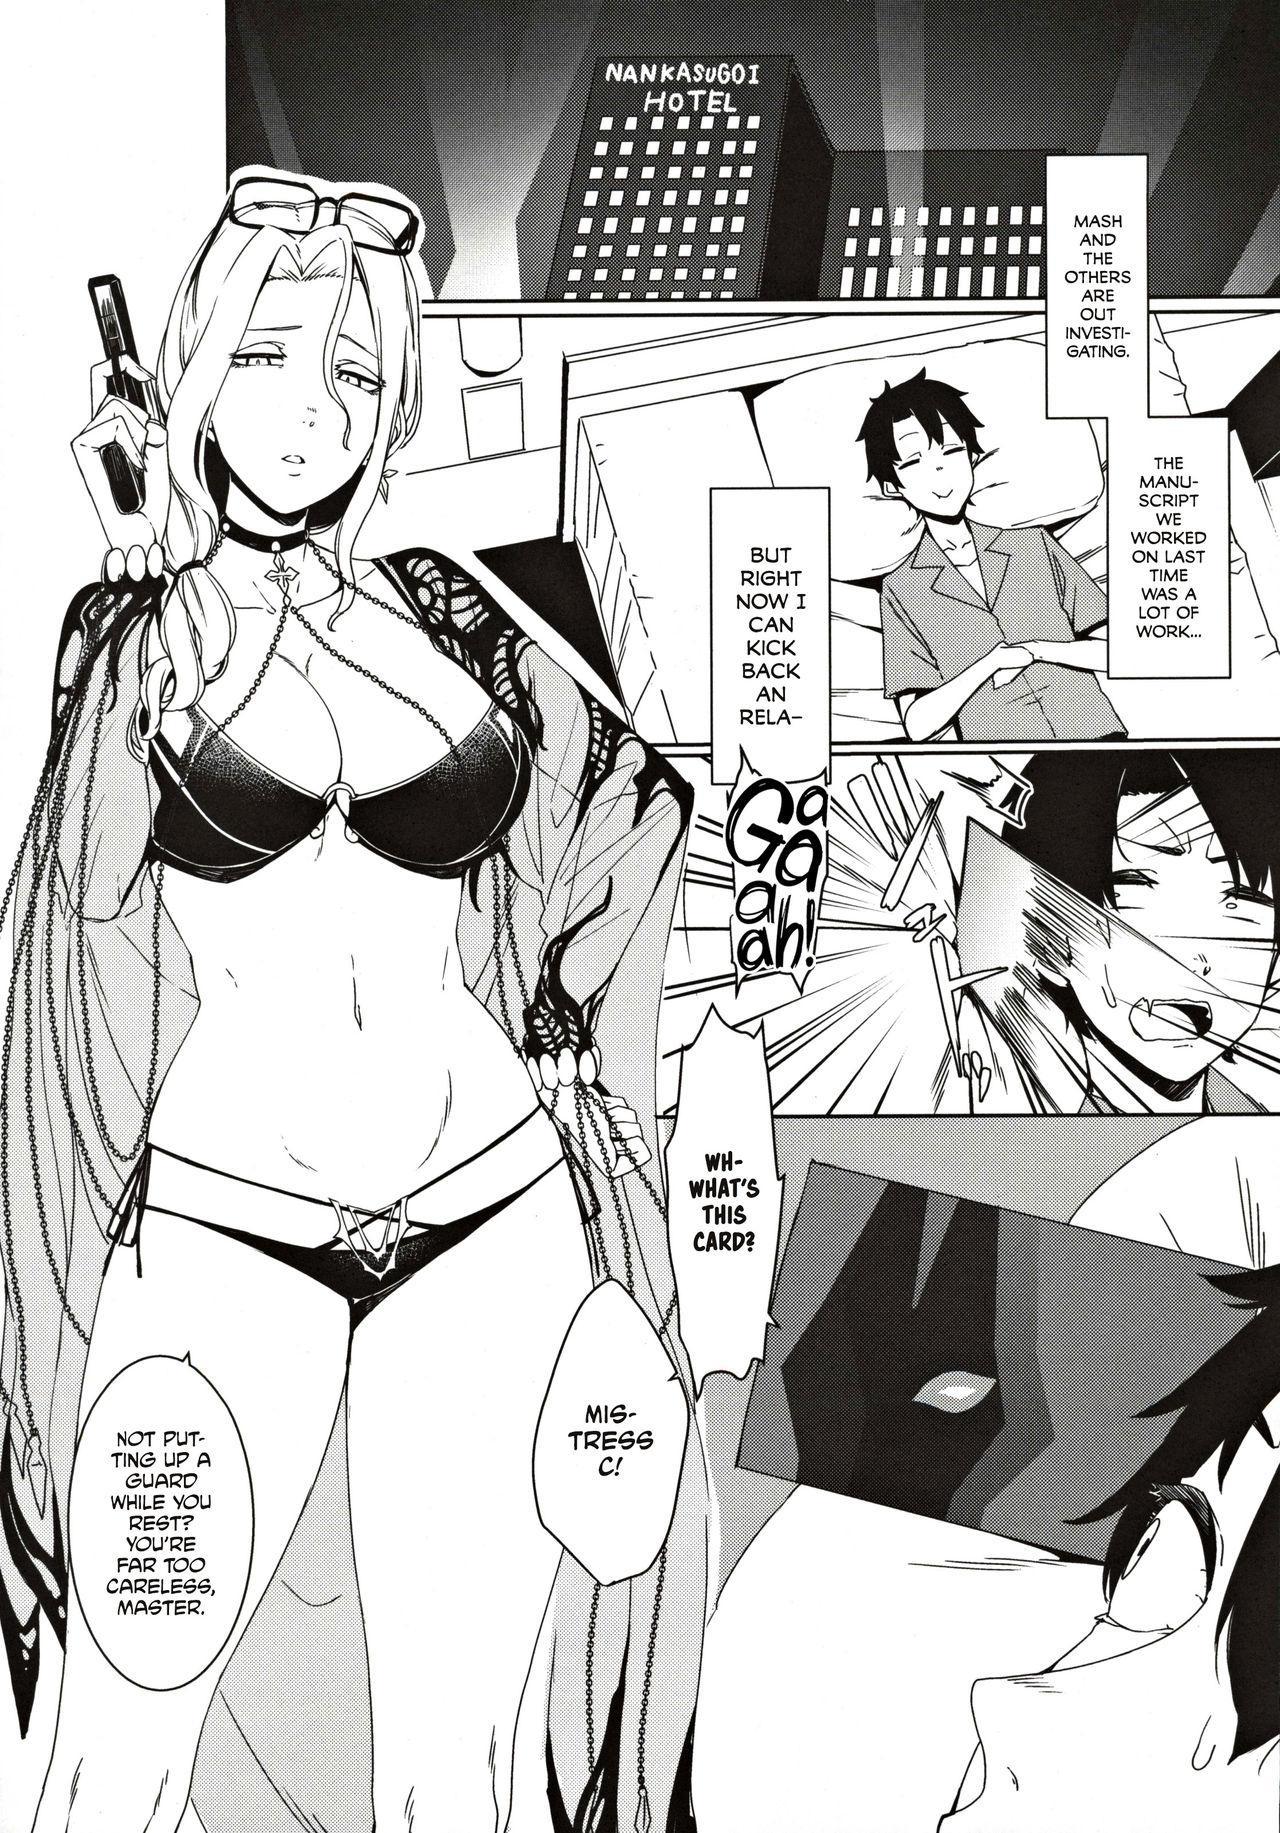 Carmilla-san no Ecchi na no ga Kakitakatta Hon | I Wanted To Draw A Book About Carmilla's Sexiness 15